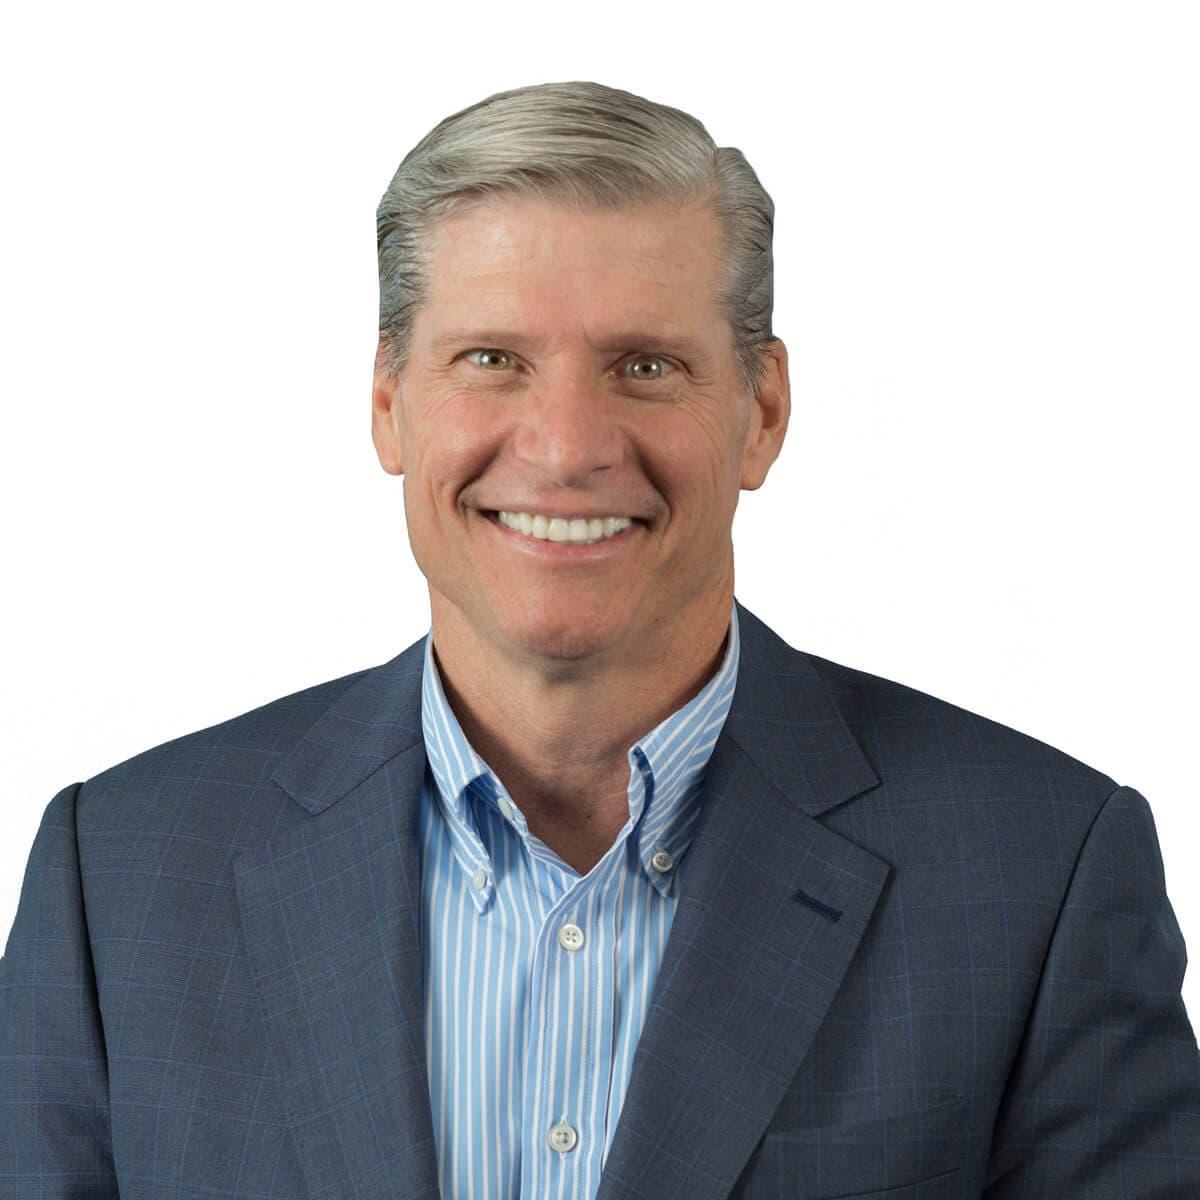 Timothy P. Sullivan